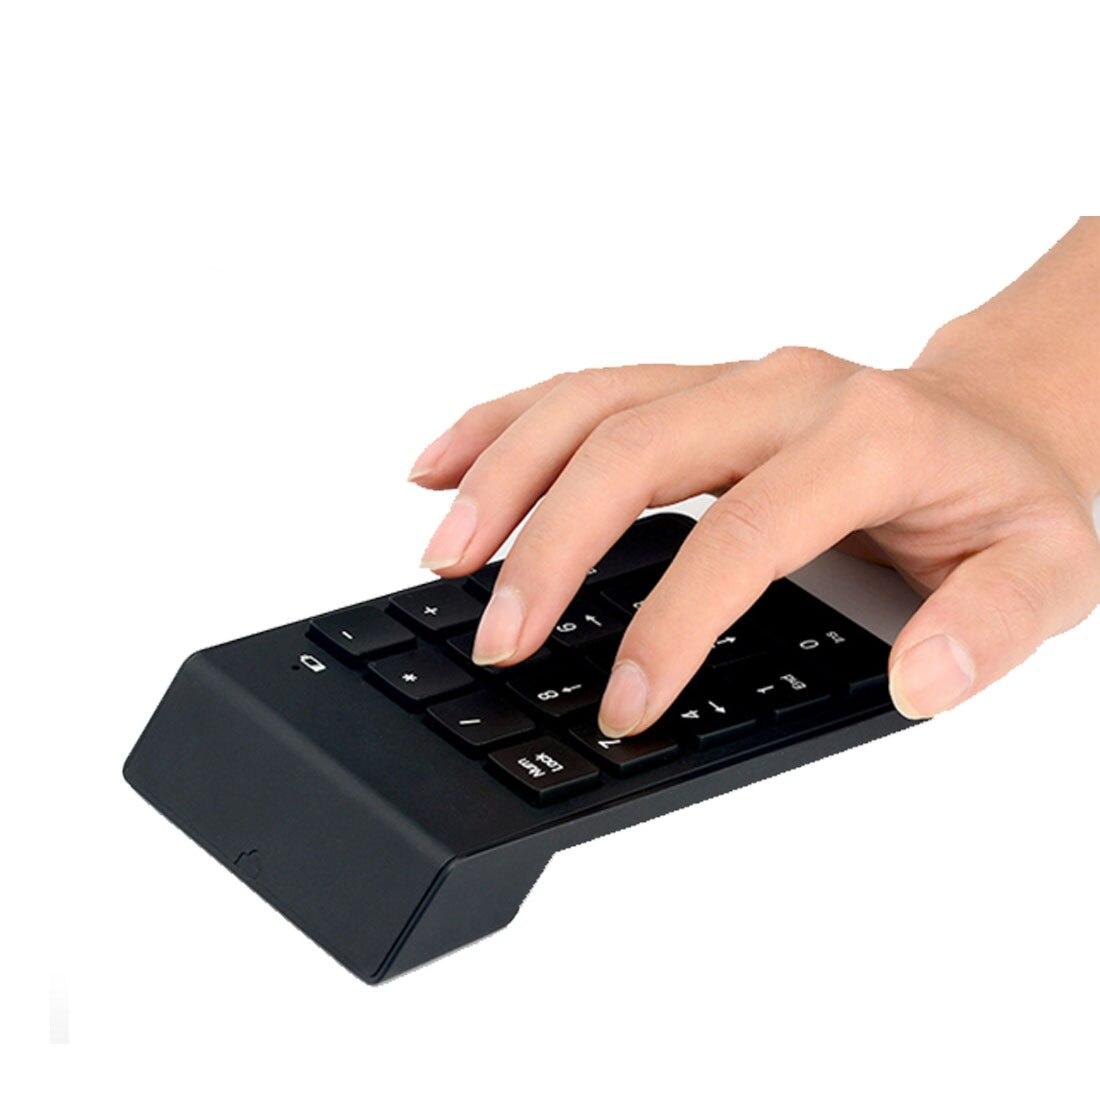 2016New High Quality Mini Numeric Keypad 18Keys Digital Keypad 2.4G USB Wireless Number Keyboard For Desktop Notebook Compatible numeric keypad 19 keys